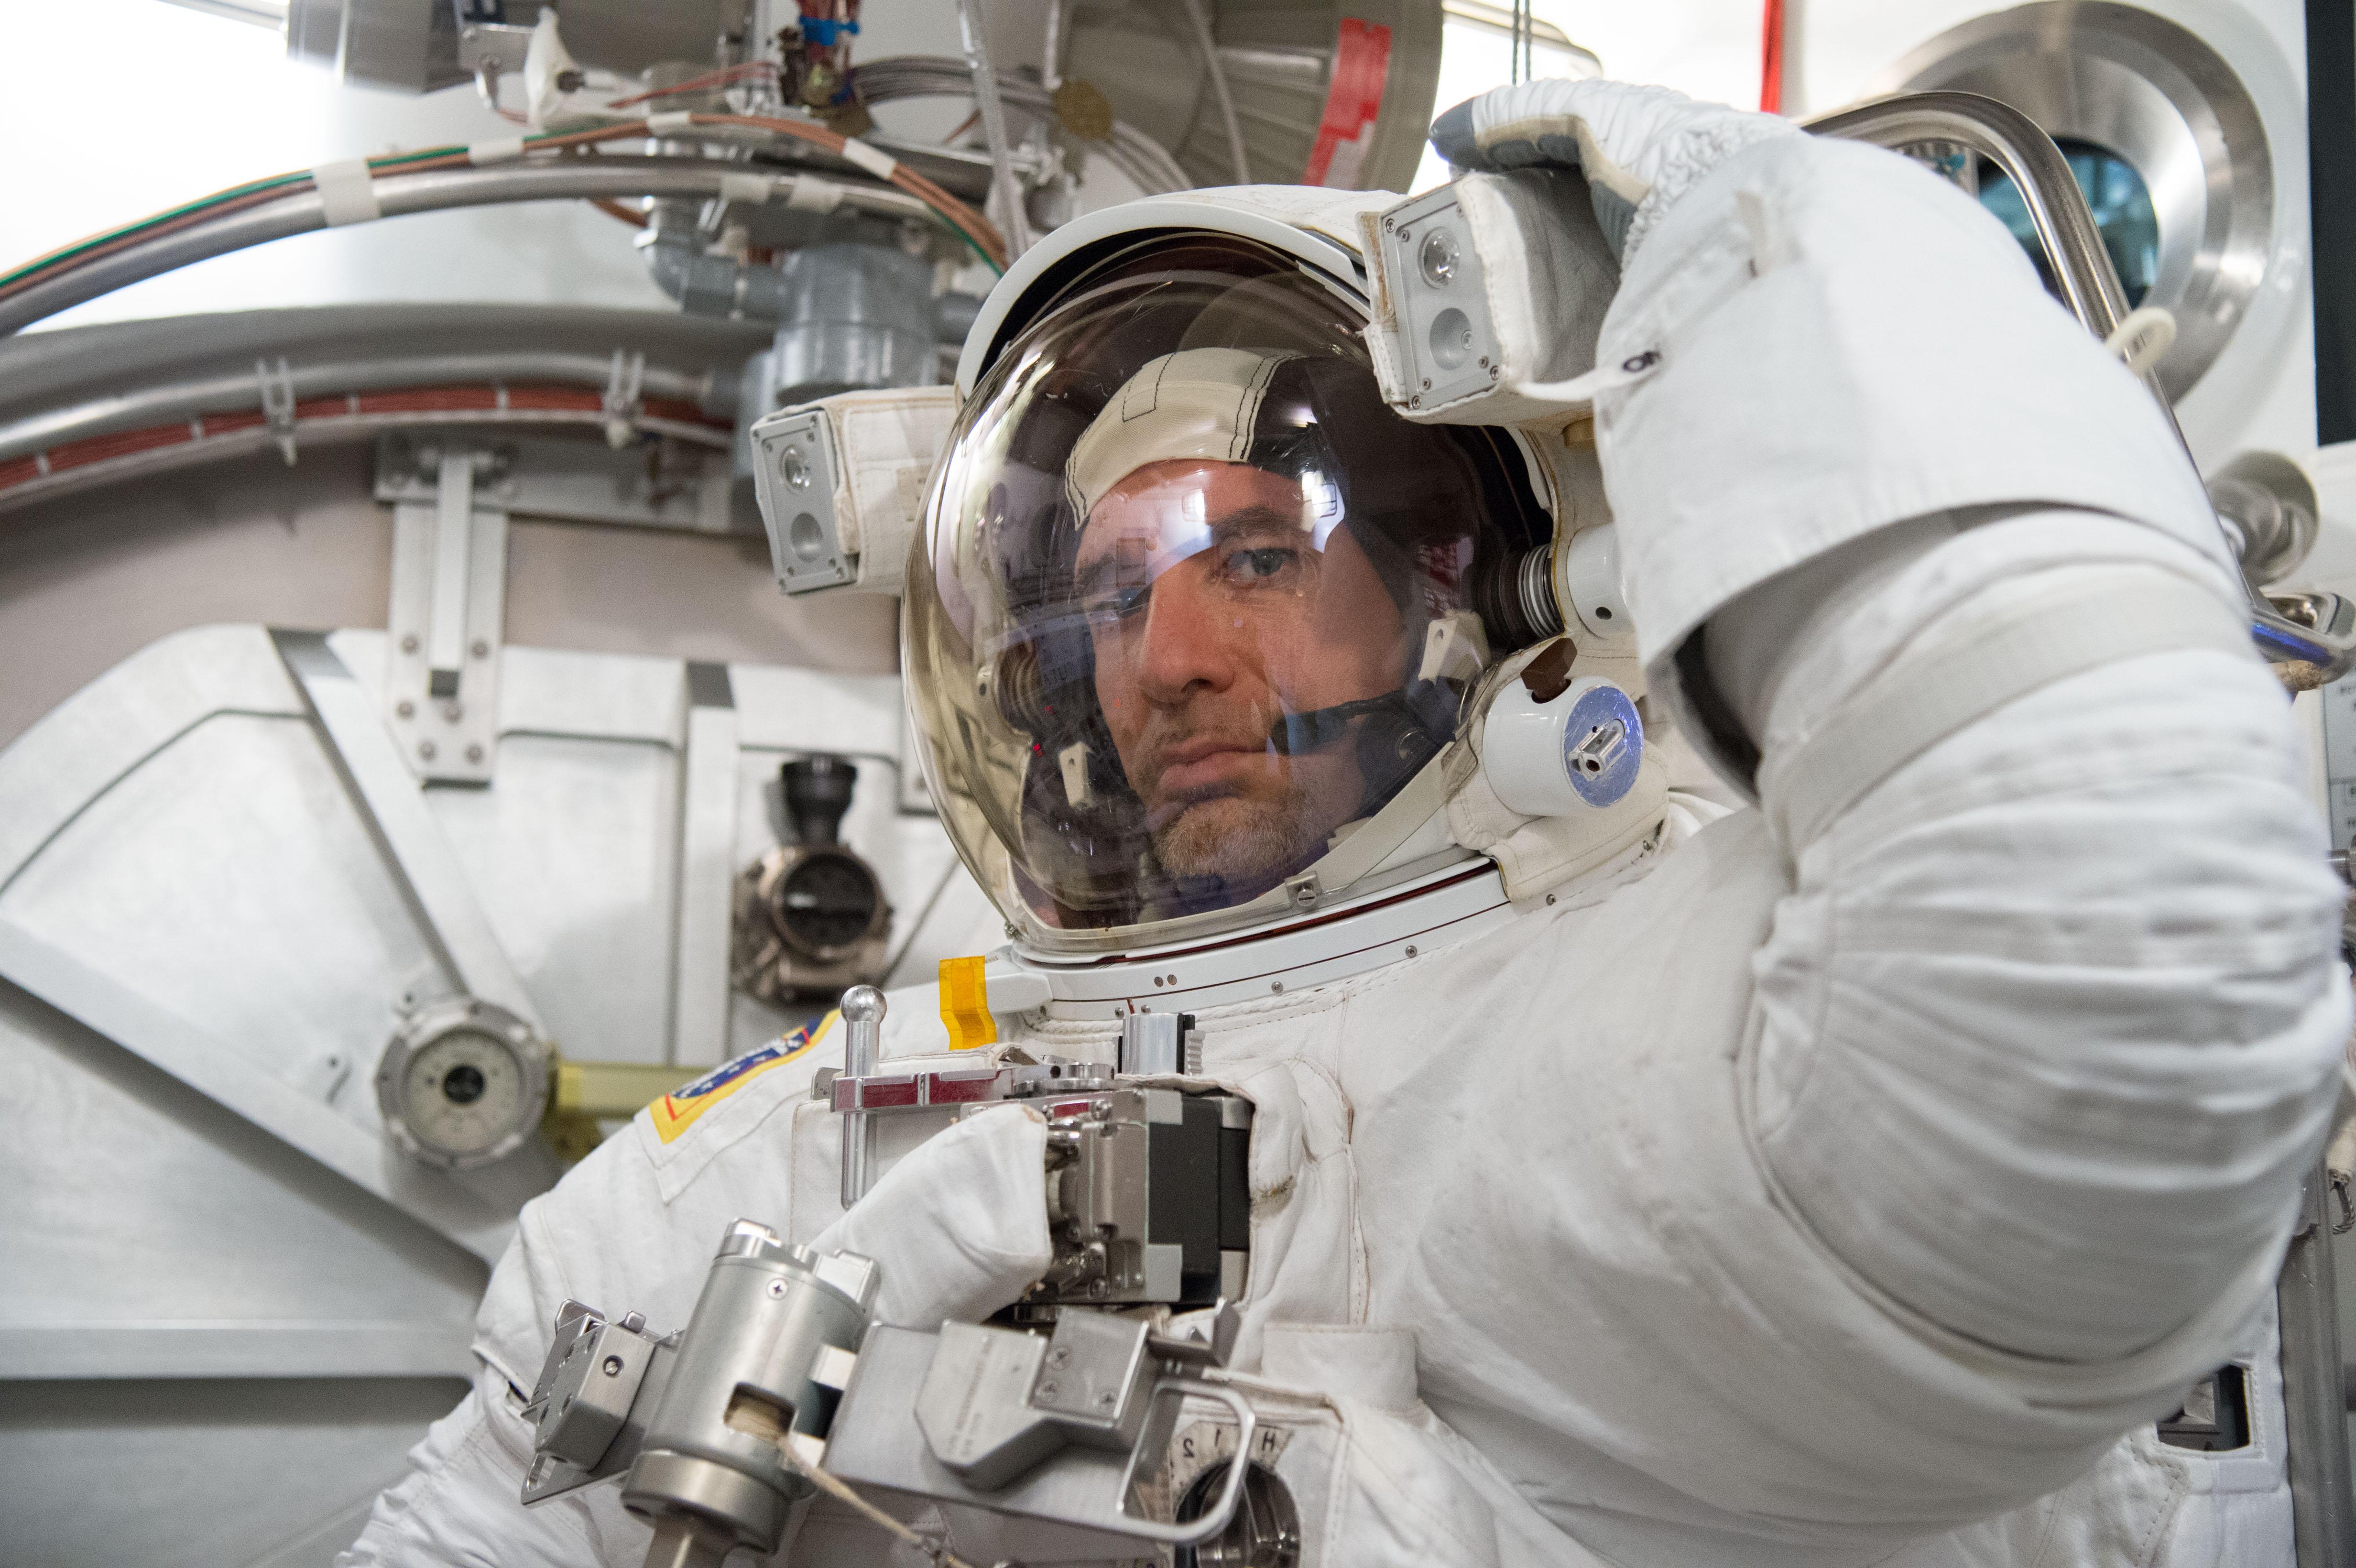 Space in Images - 2013 - 04 - Luca in NASA spacesuit